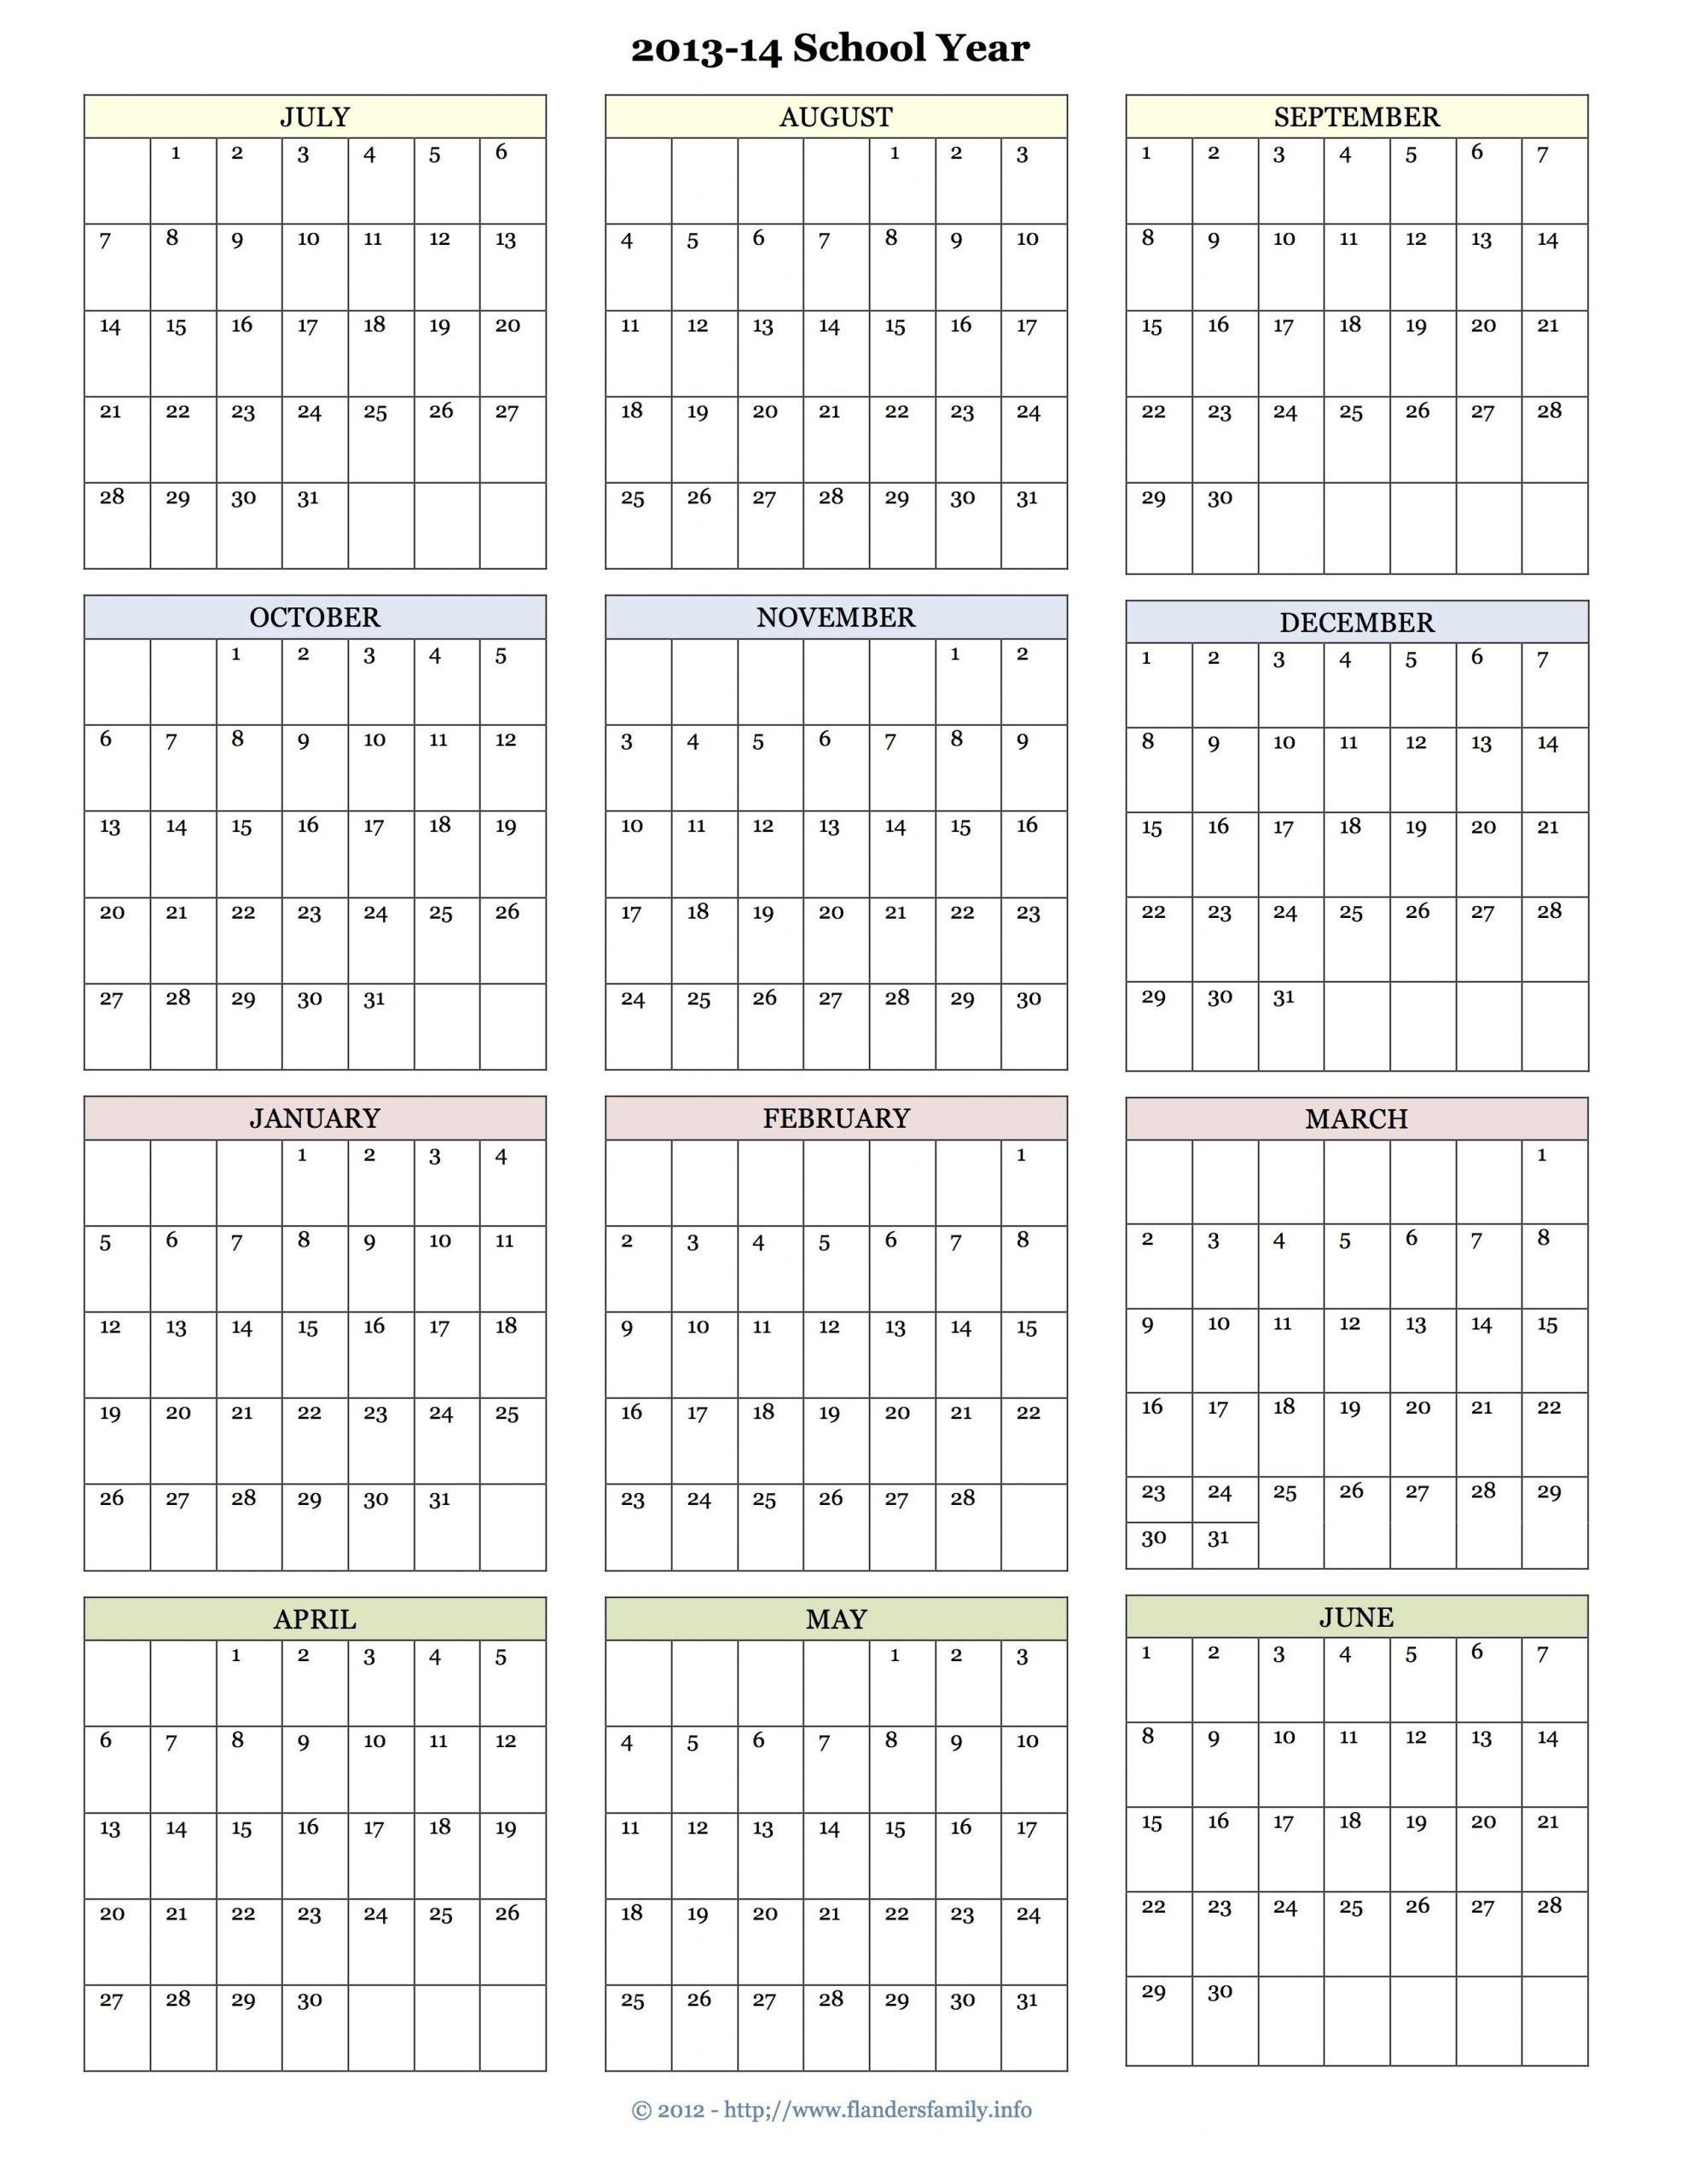 Depo Shot Calendar 2019 Depo Provera Injection Calendar 2018  When Is Next Depoprovera Injection Due After April 1, 2021